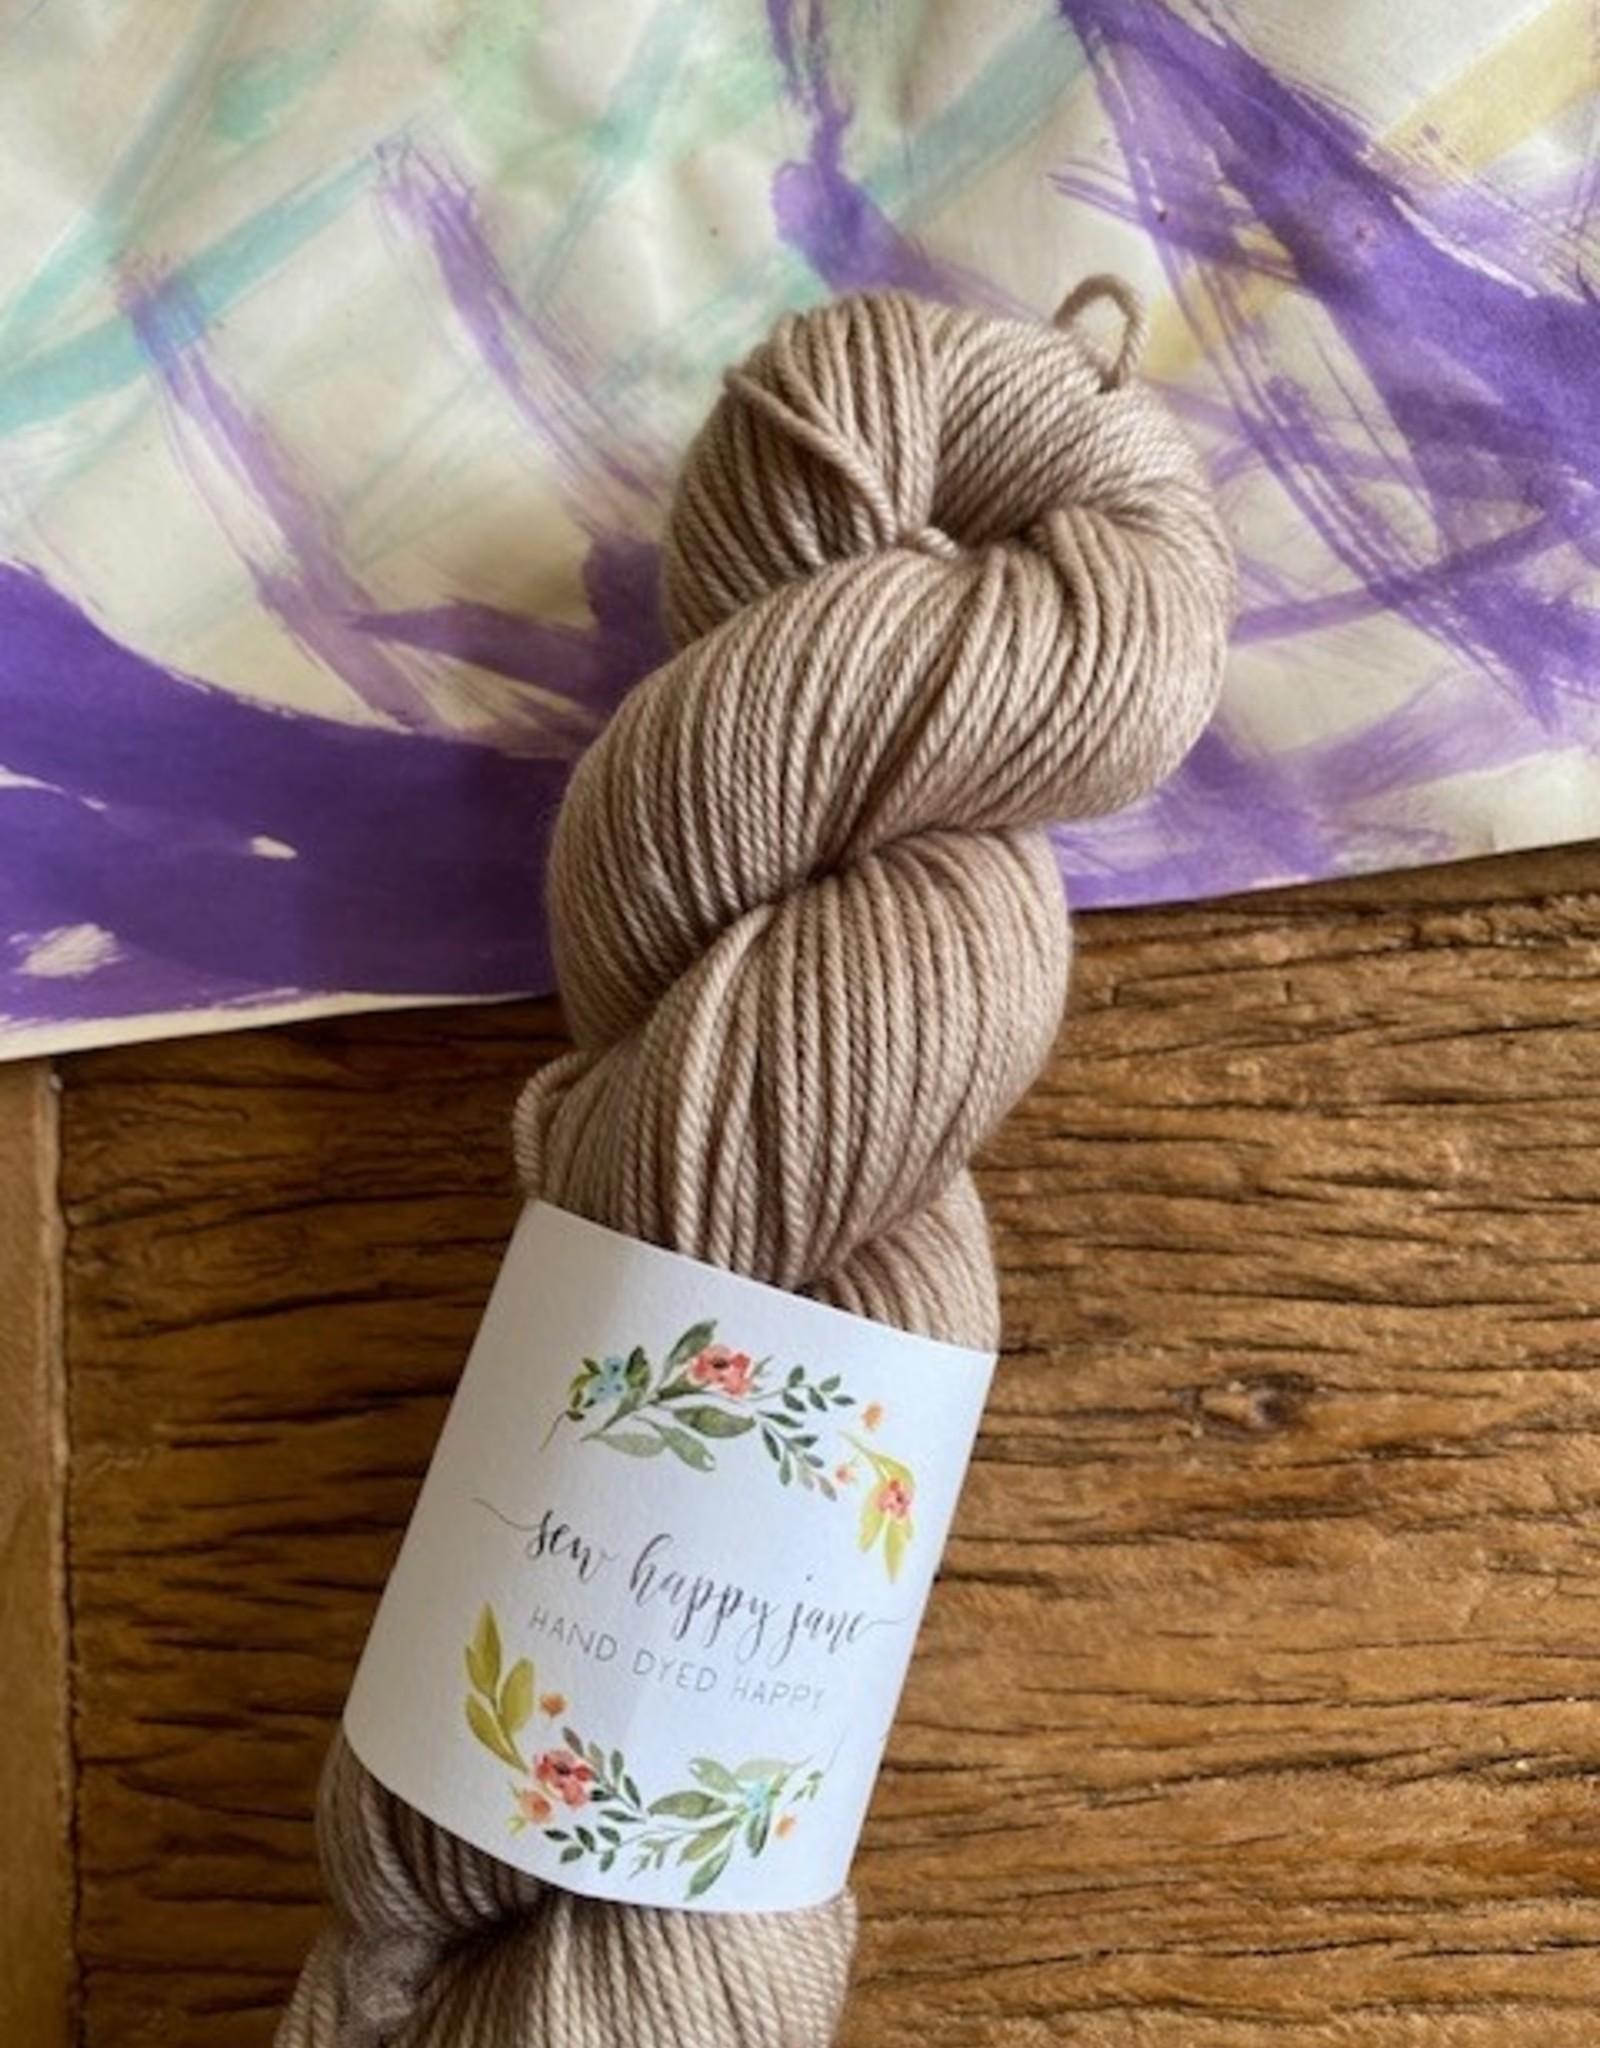 Sew Happy Jane Delightful DK Linen